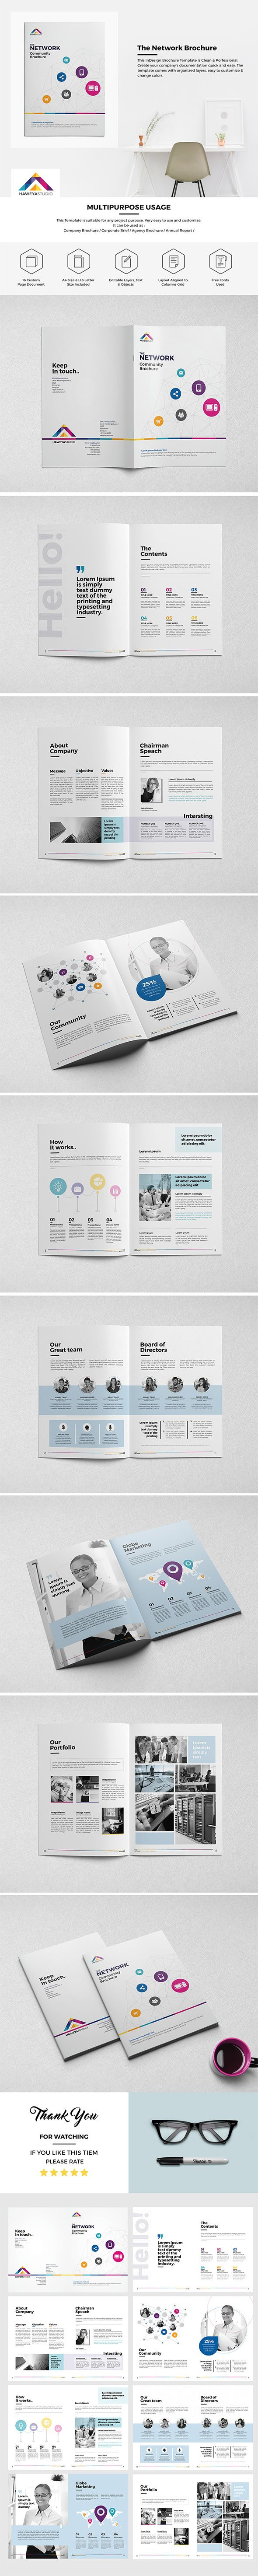 21 besten Brochure Template Bilder auf Pinterest | Broschüren ...